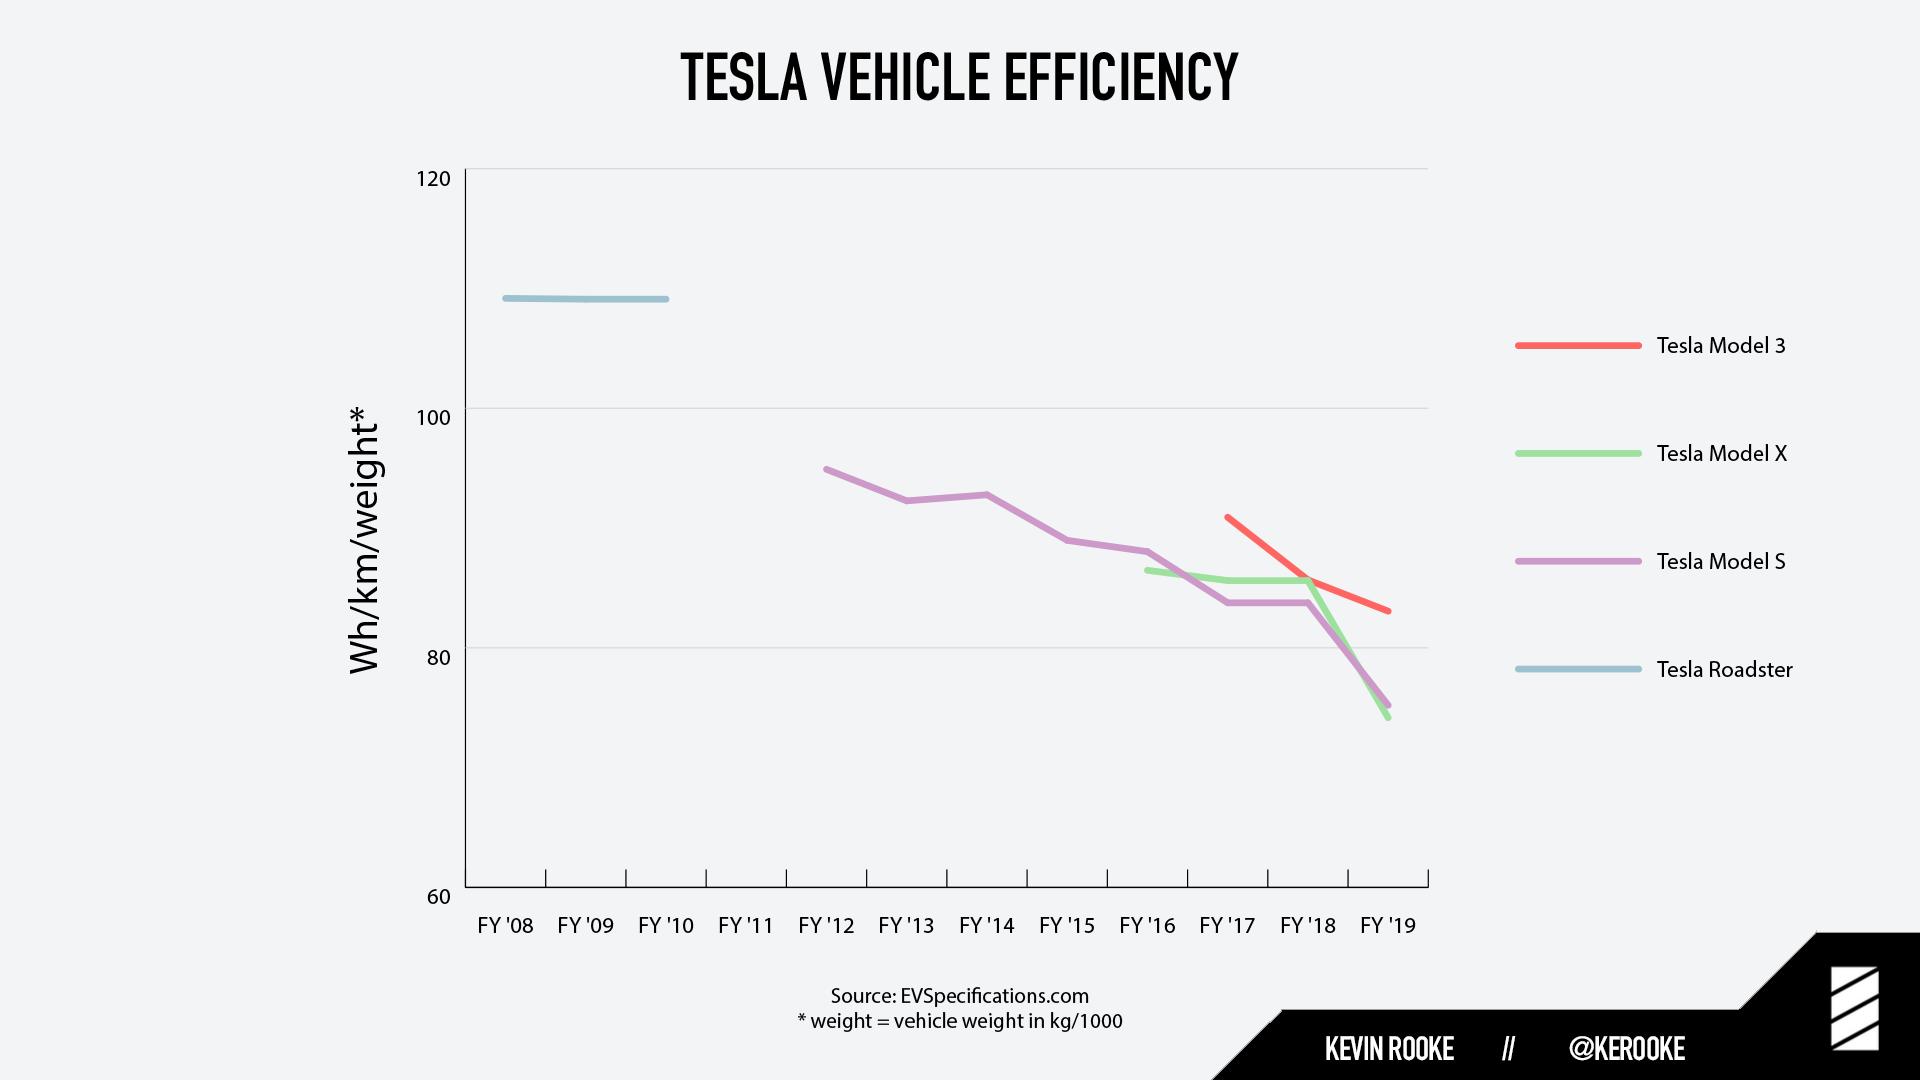 tesla-vehicle-efficiency-kevin-rooke